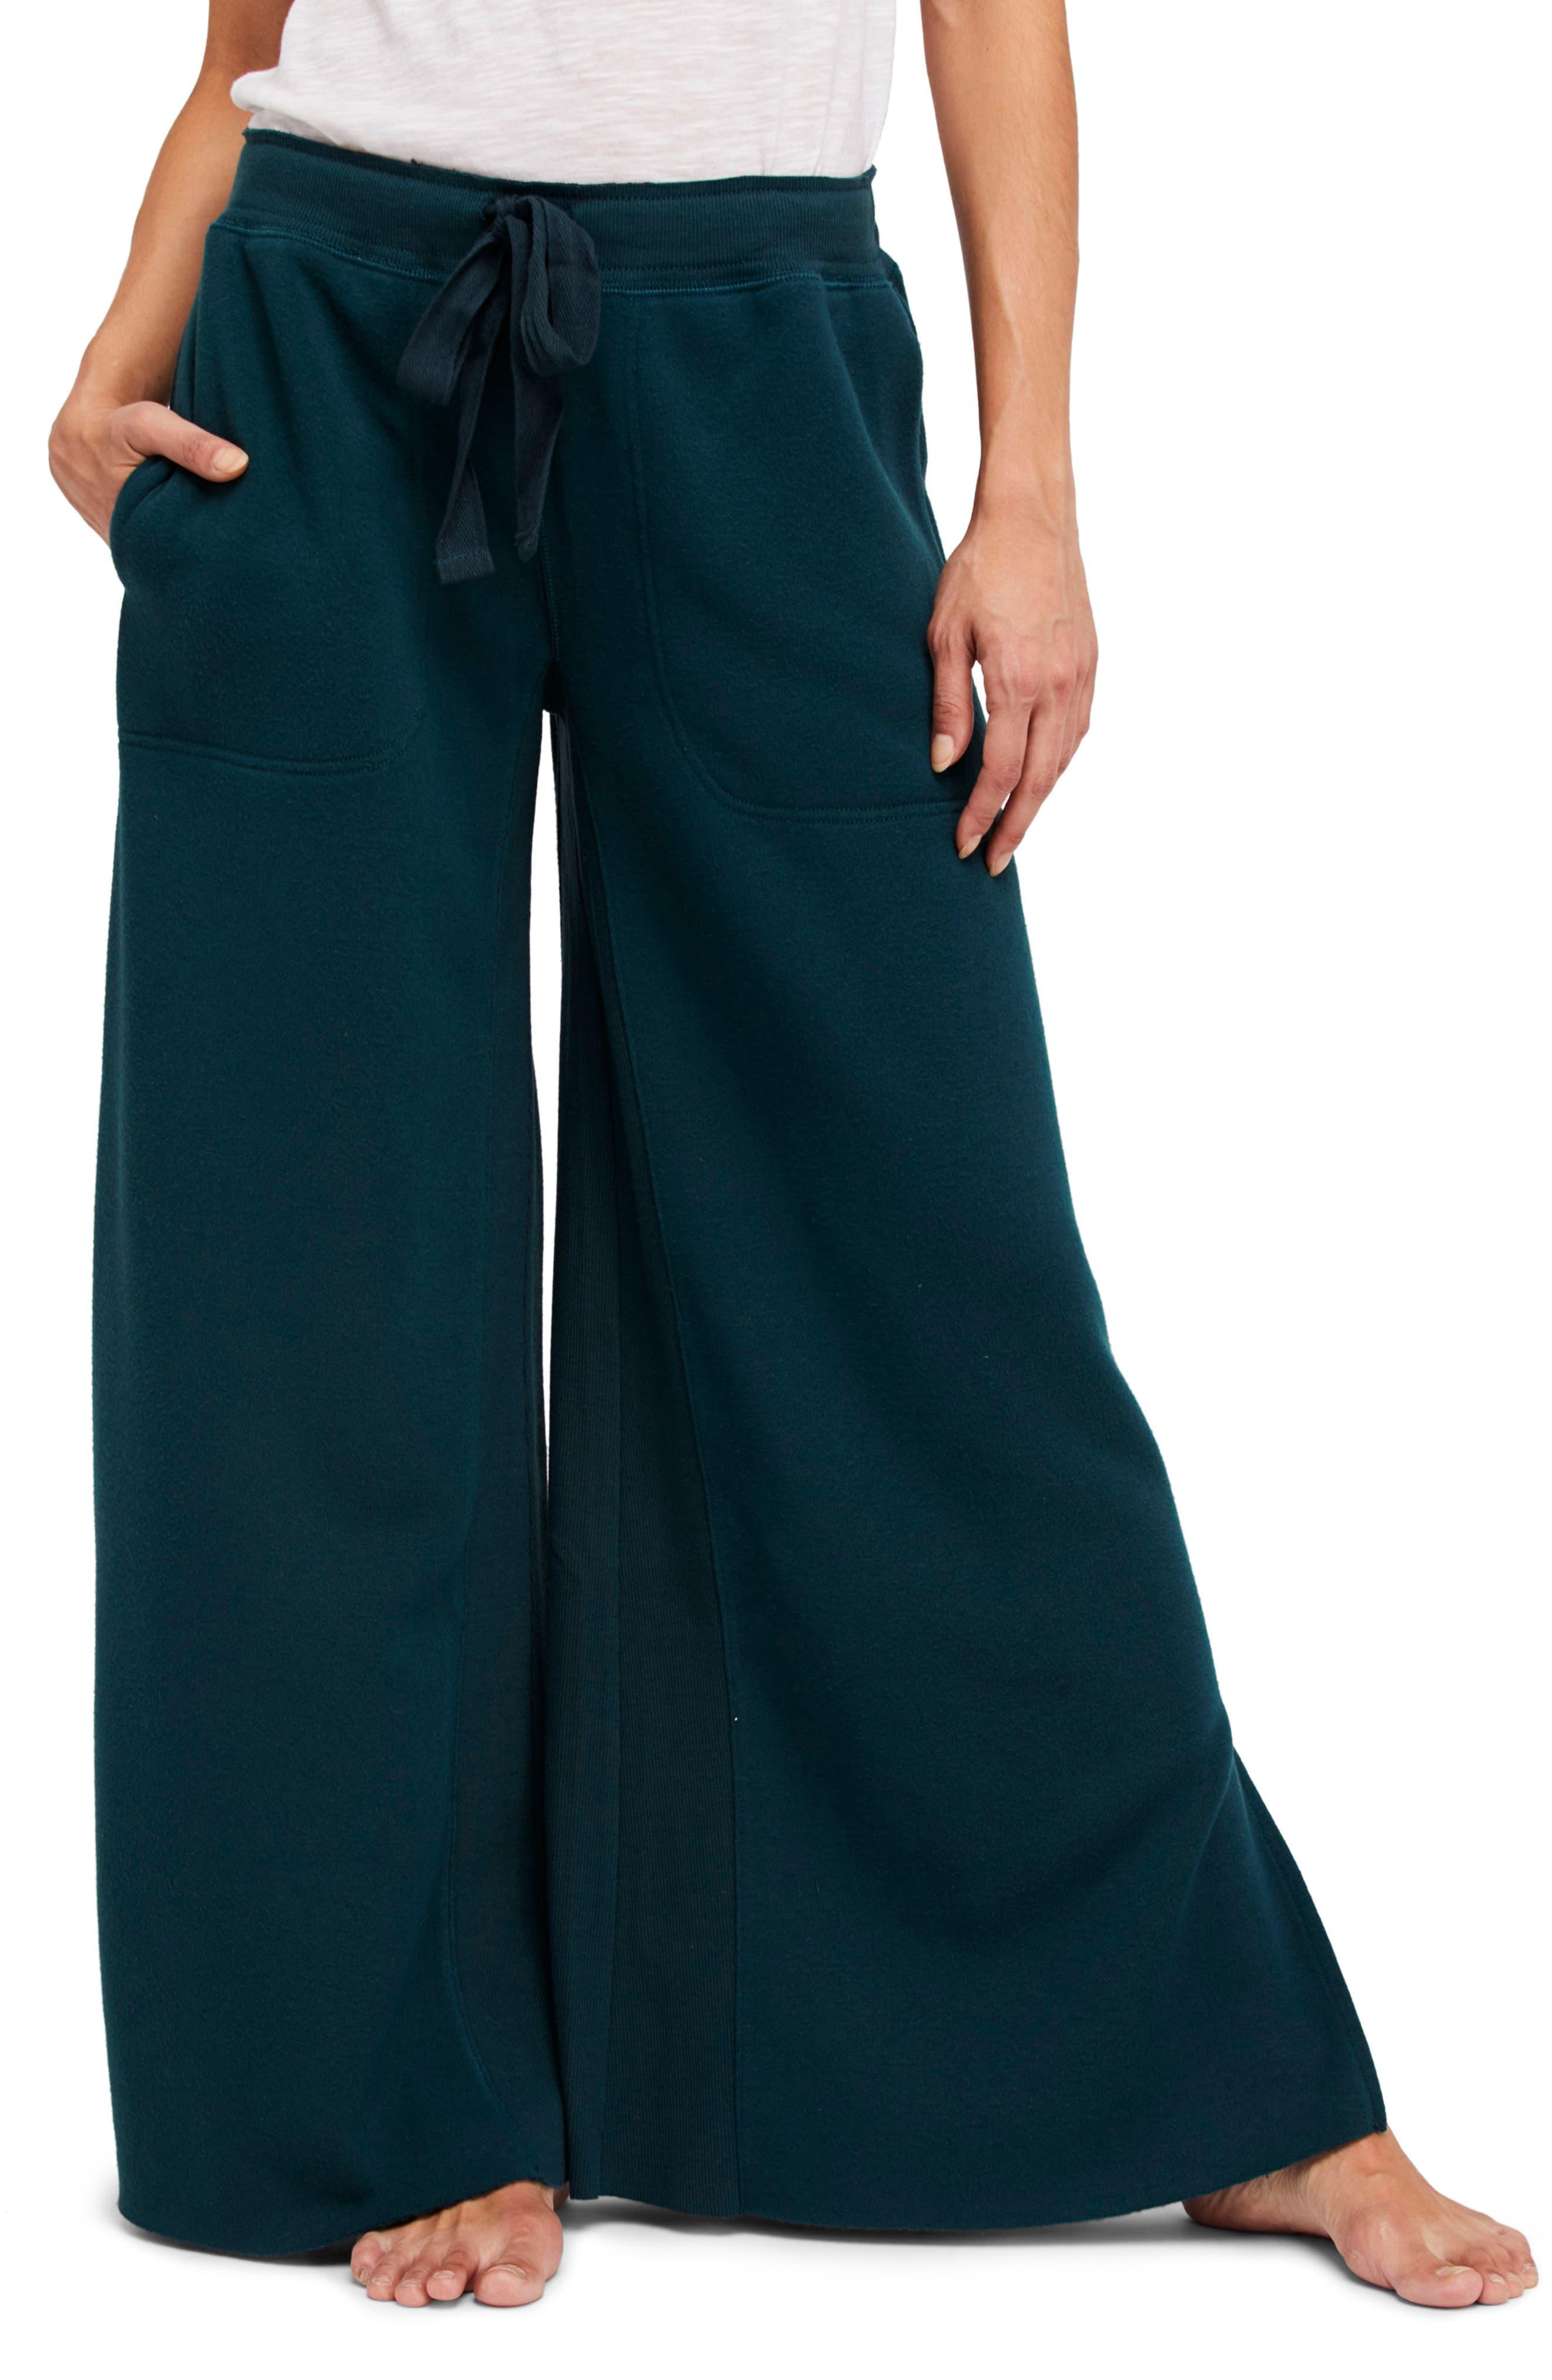 Double Axel Jogger Pants,                             Main thumbnail 1, color,                             Turquoise